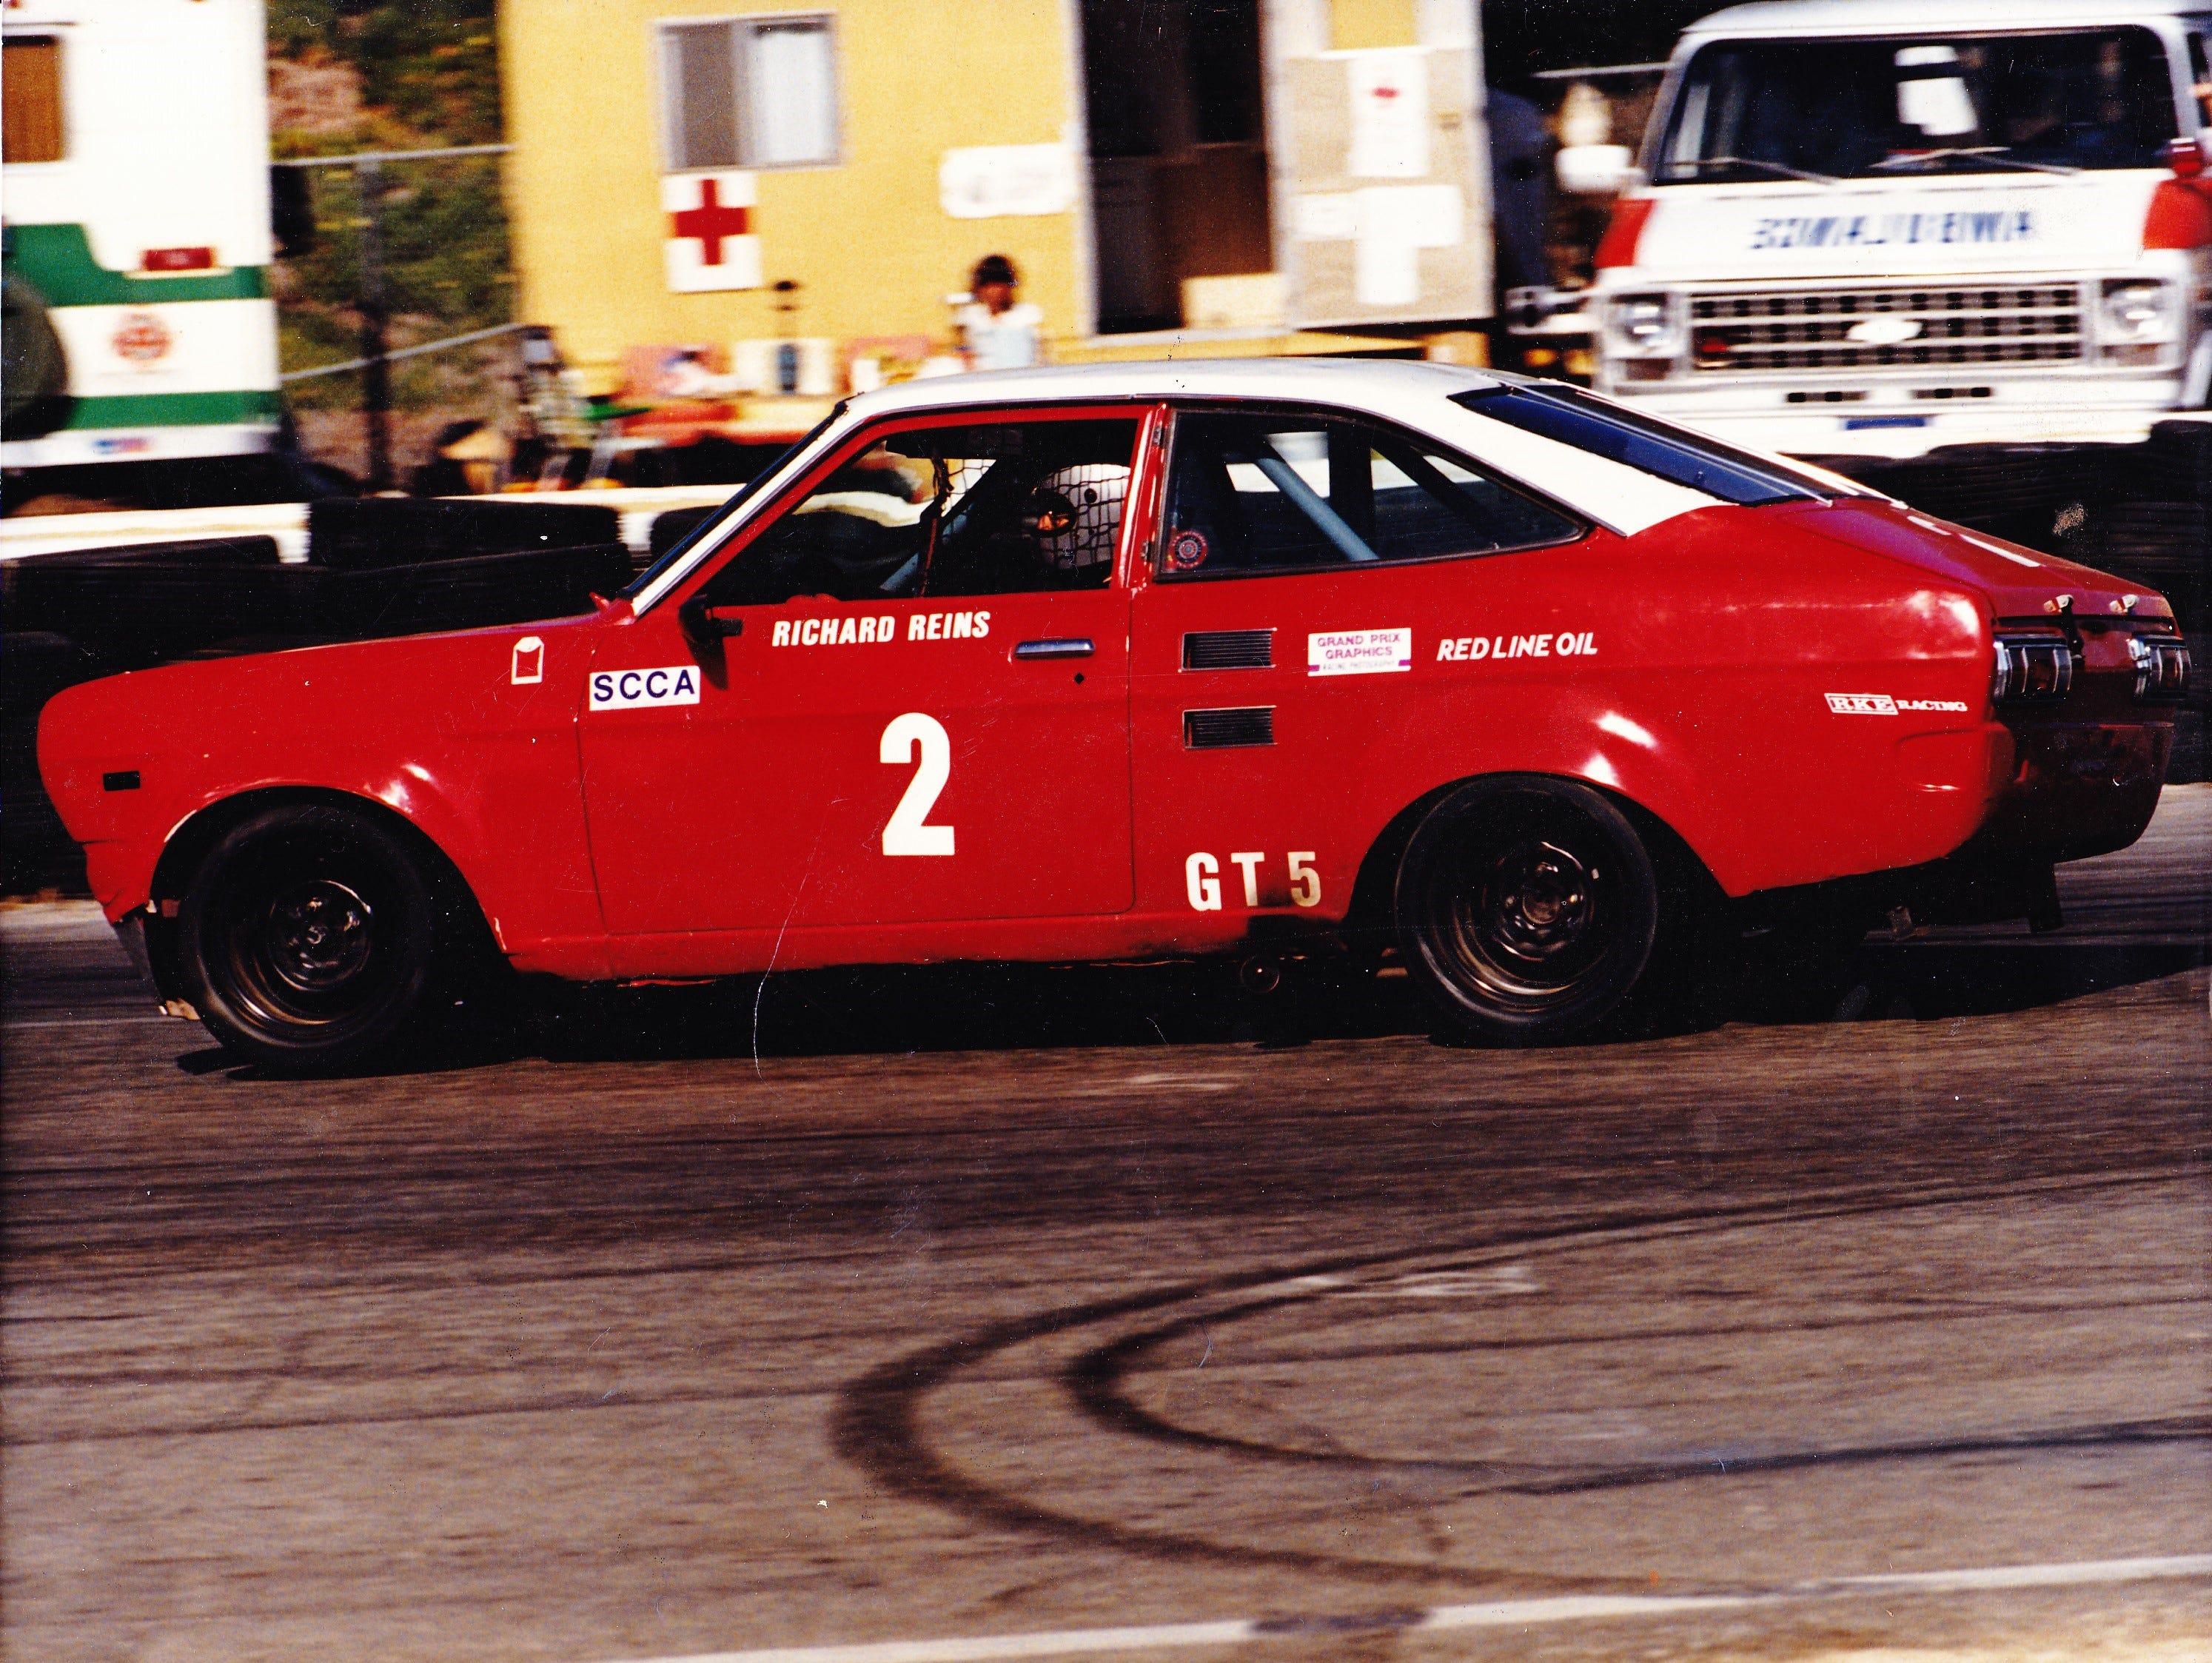 Richard Reins in his racecar.